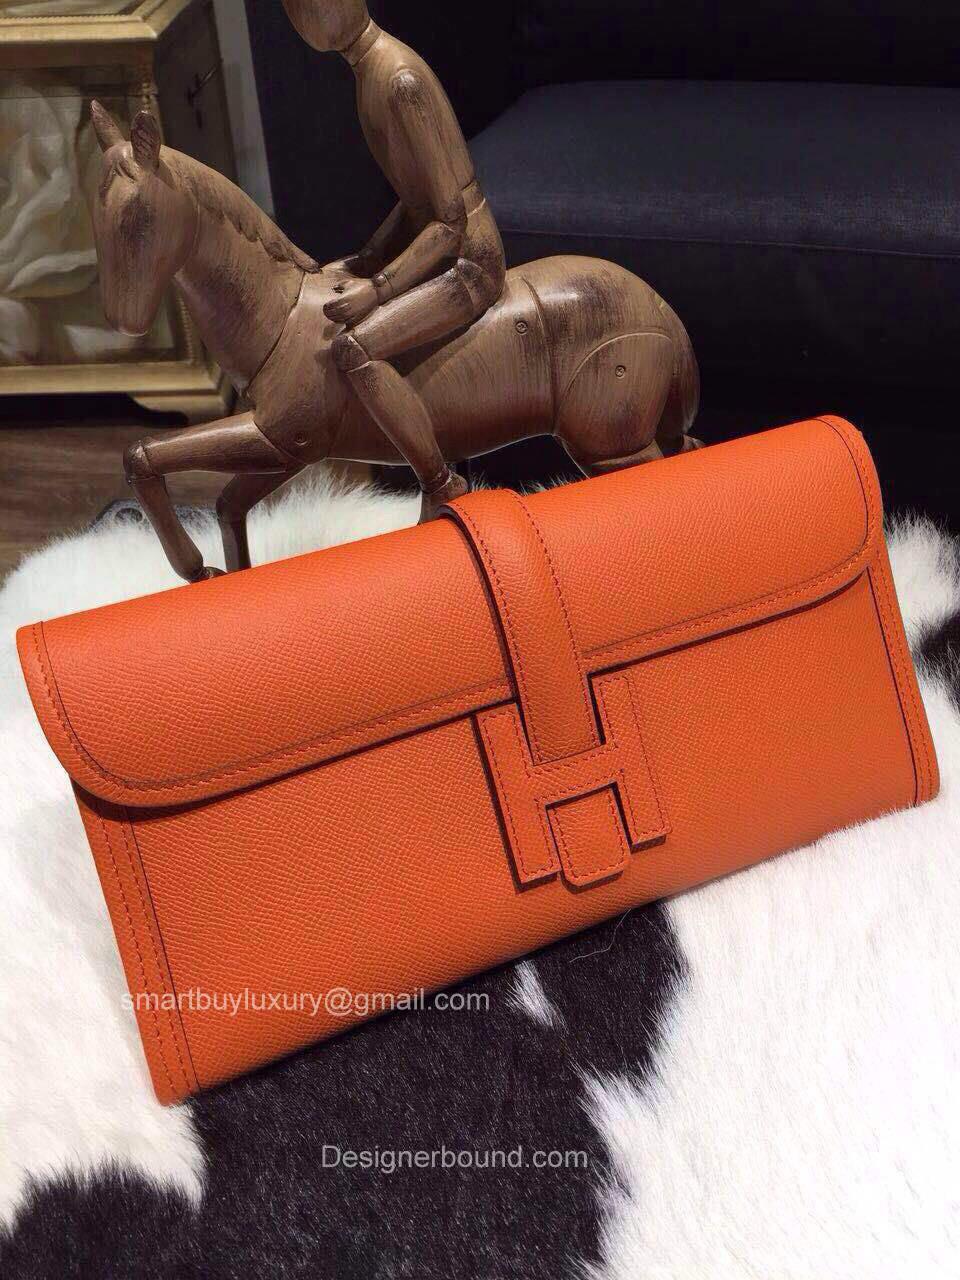 4e65ab206d57 Hermes Jige Elan Clutch in Orange Epsom Leather Best Replica ...